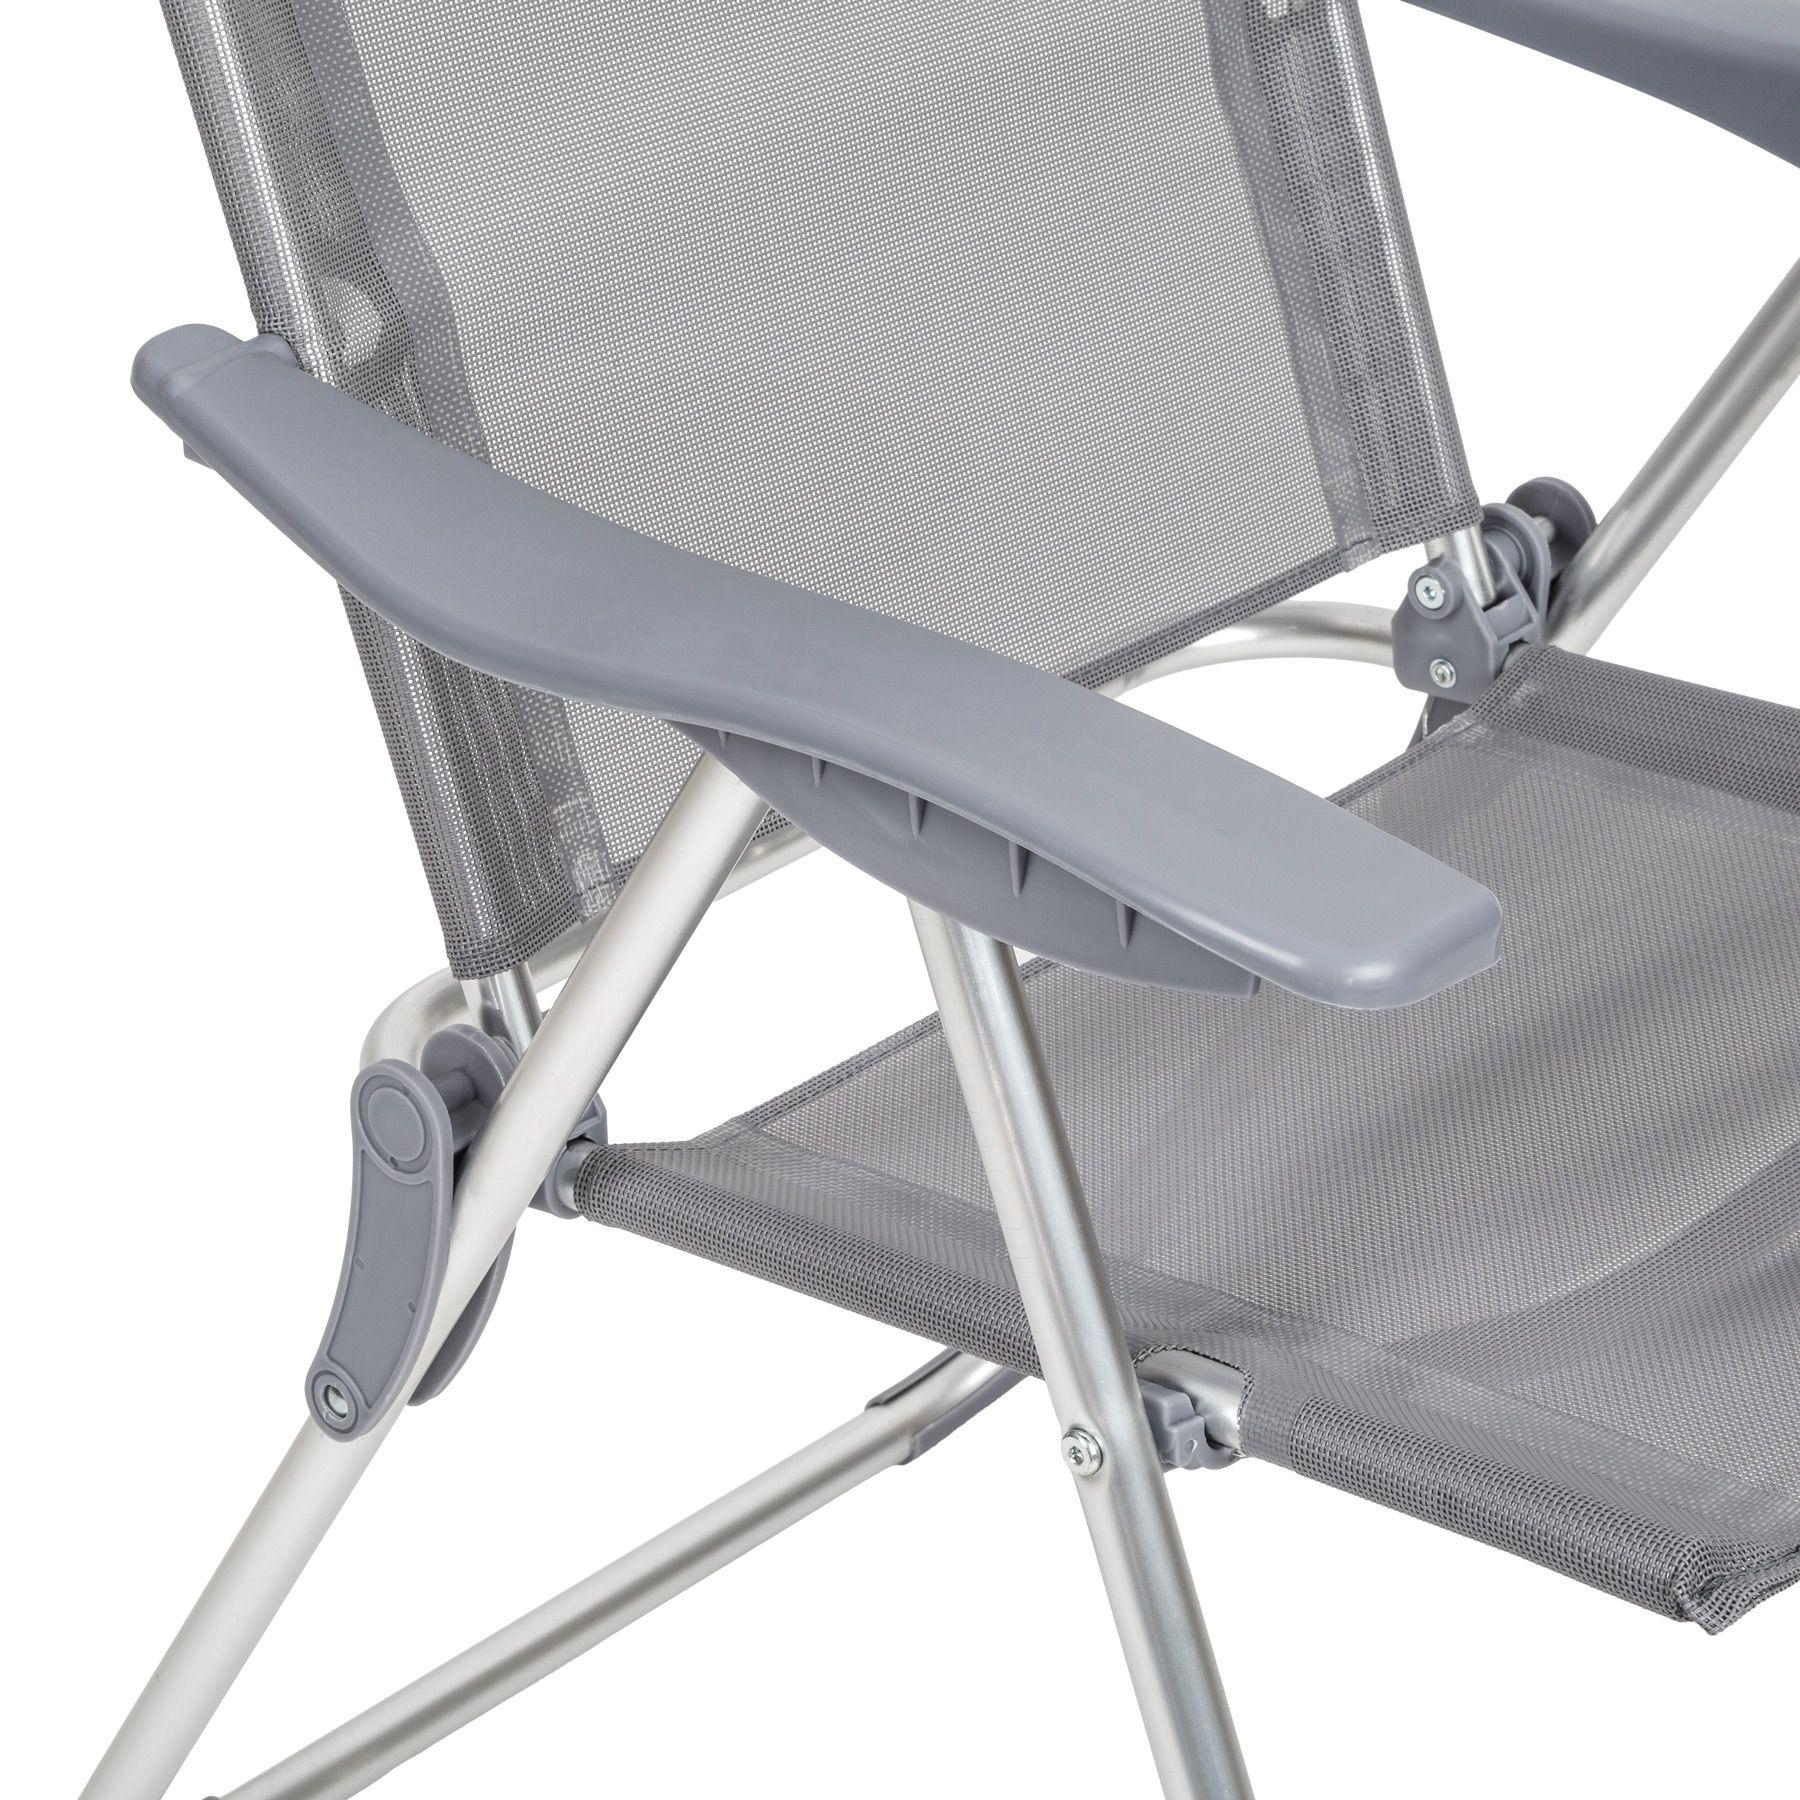 4er set alu klappstuhl gartenstuhl aluminium campingstuhl hochlehner grau ebay. Black Bedroom Furniture Sets. Home Design Ideas